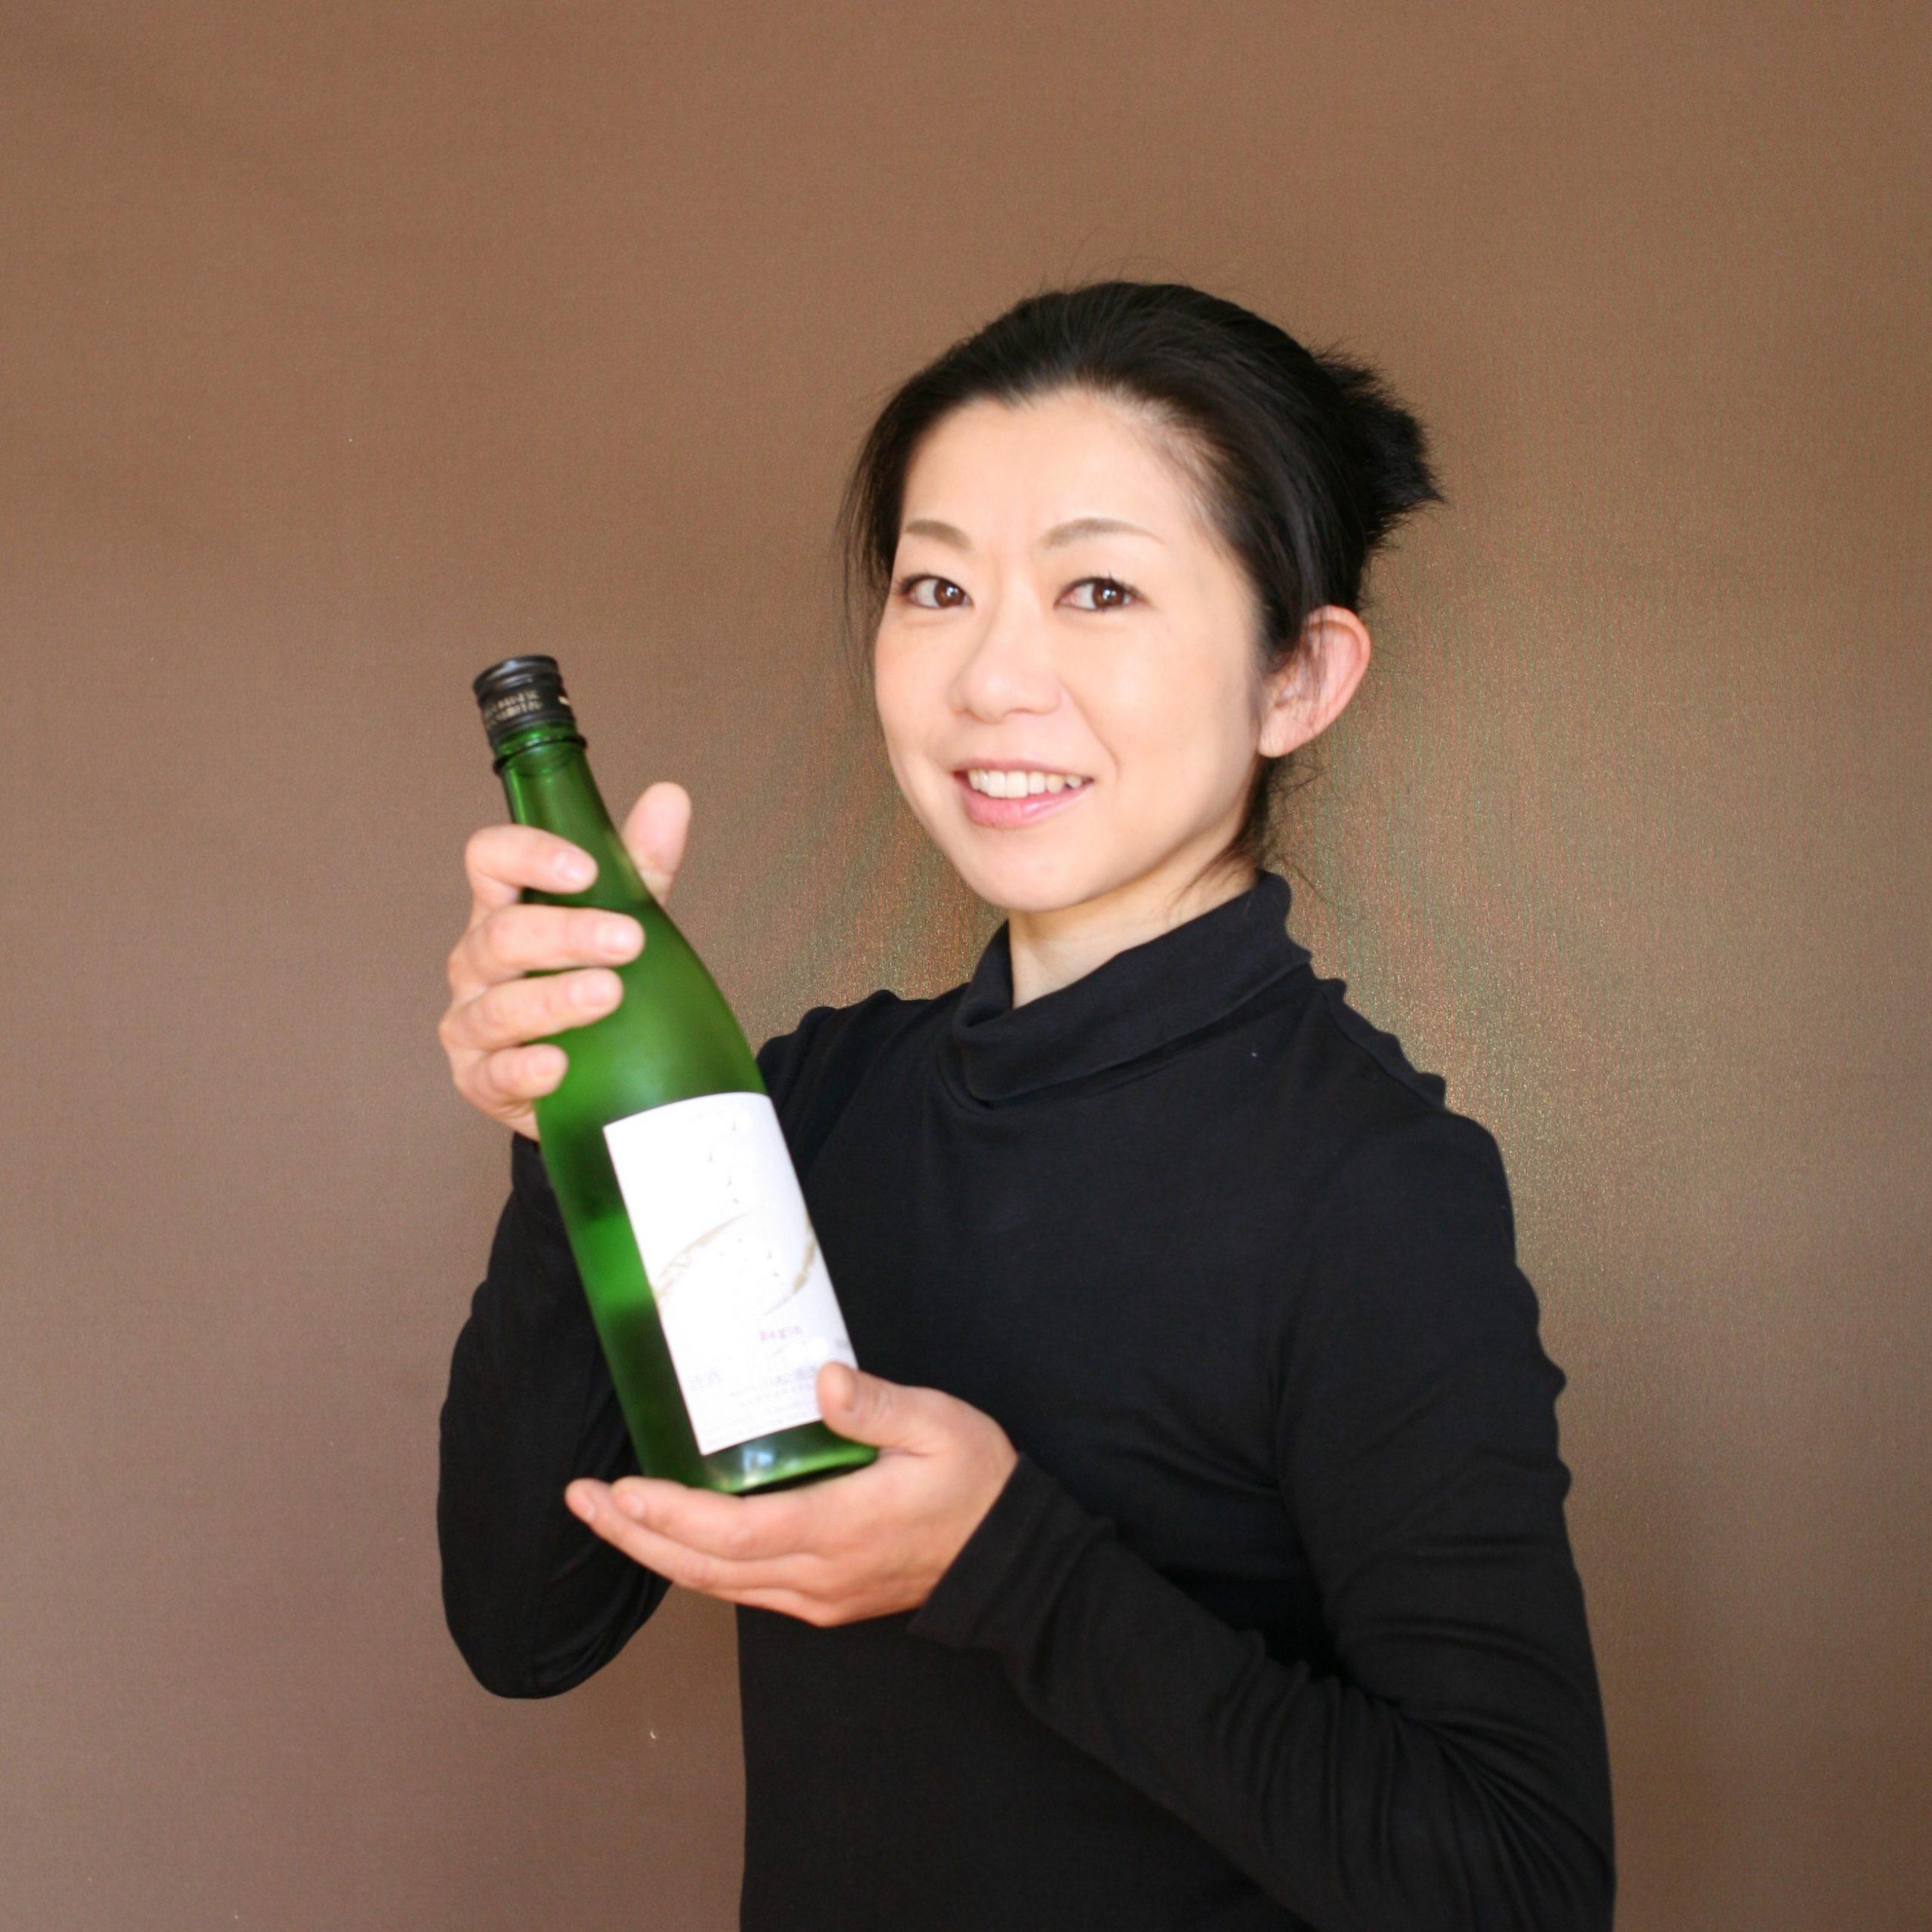 Mayumi Ymamamura